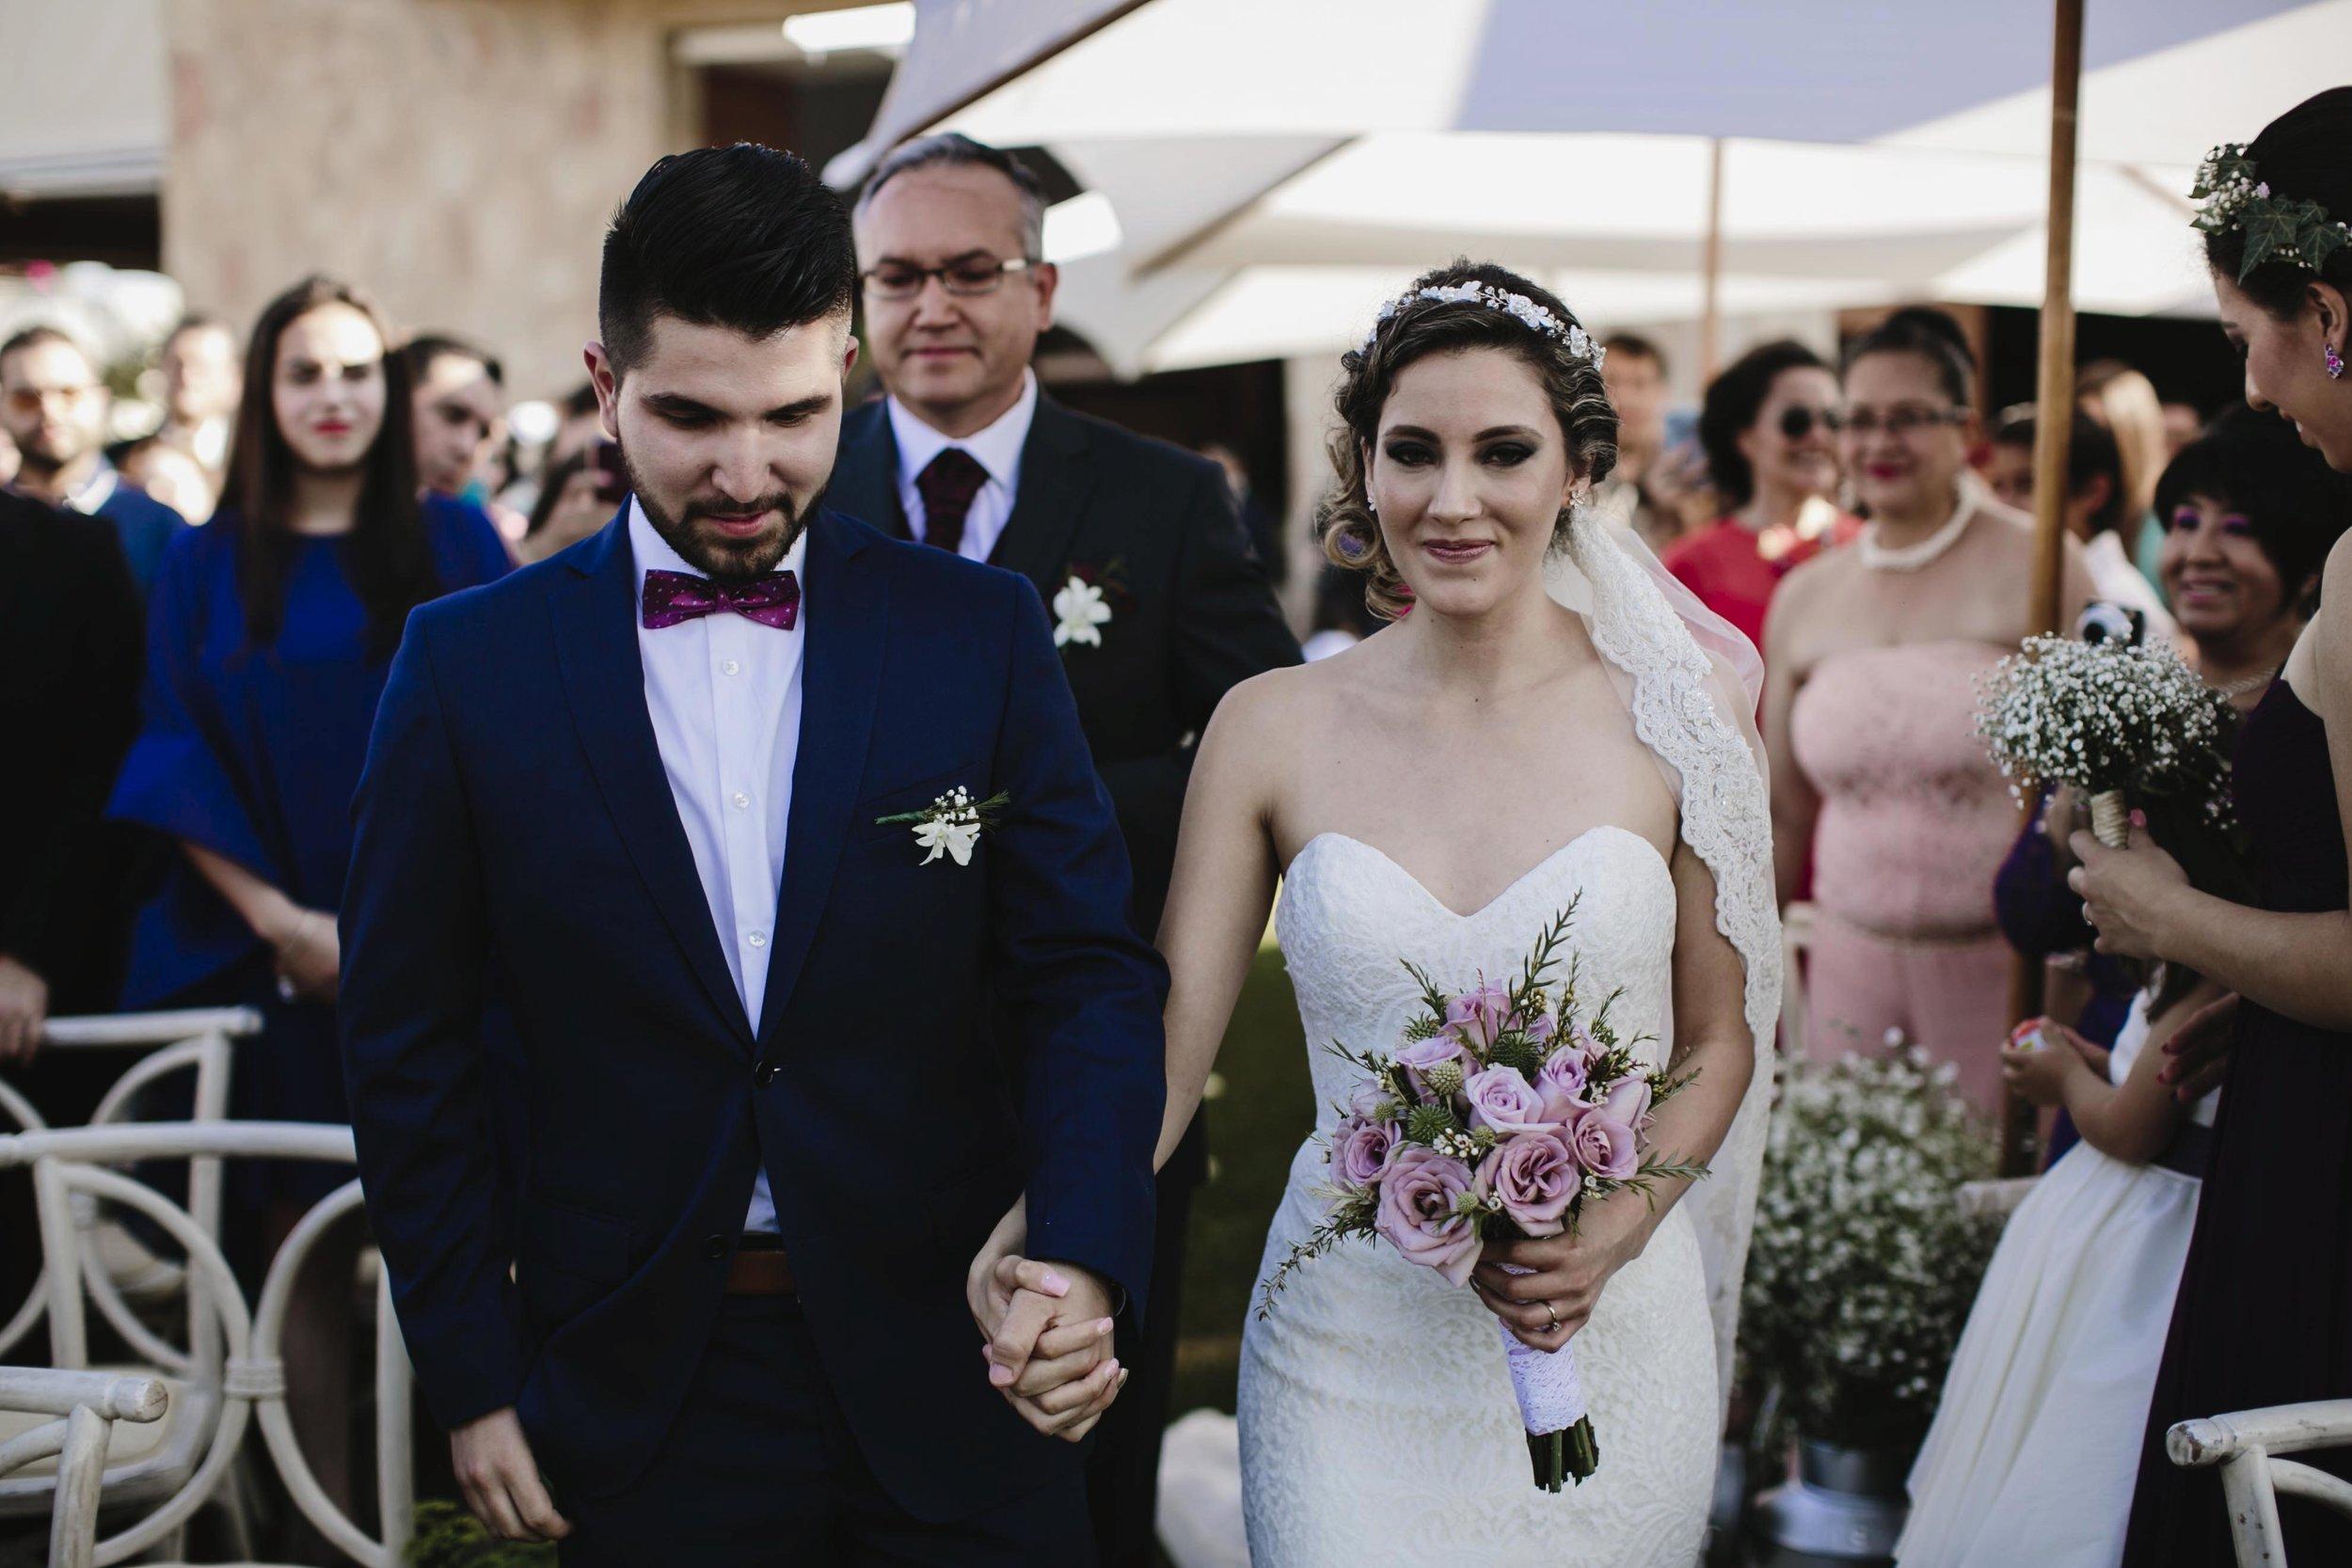 alfonso_flores_destination_wedding_photography_jardin_amarello_cuernavaca78.jpg